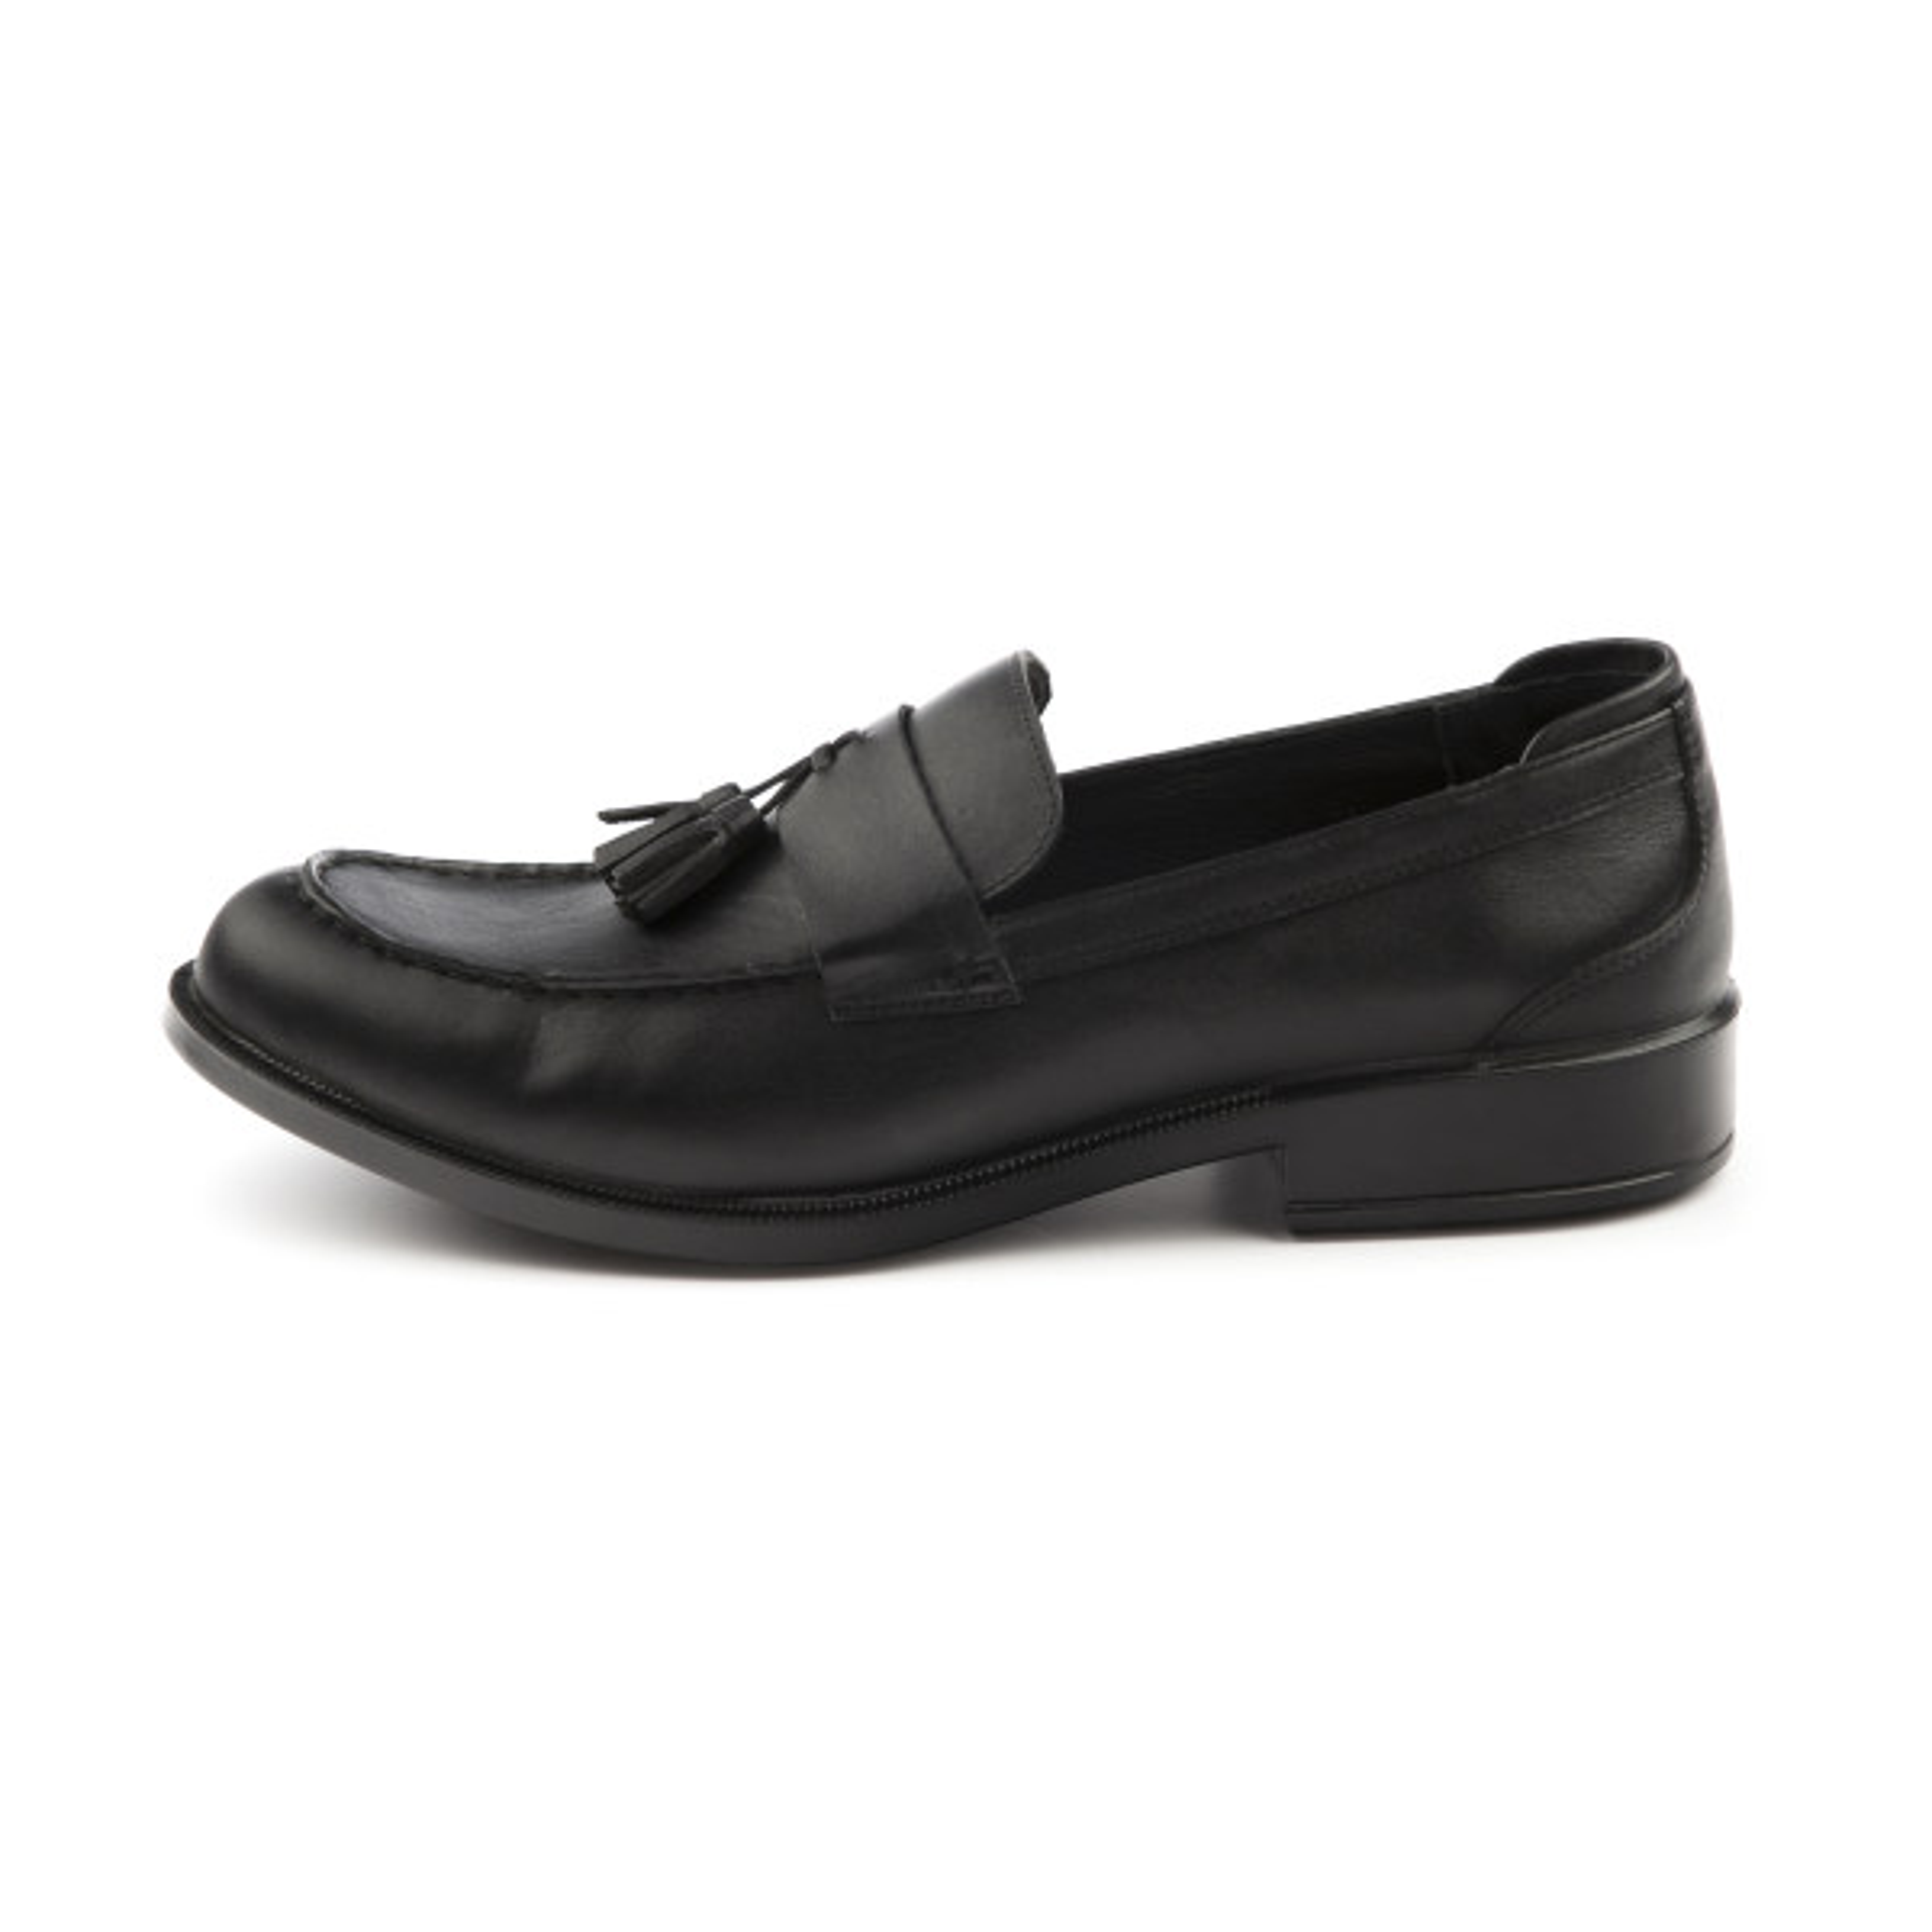 کفش مردانه آلدو مدل 122012102-Black